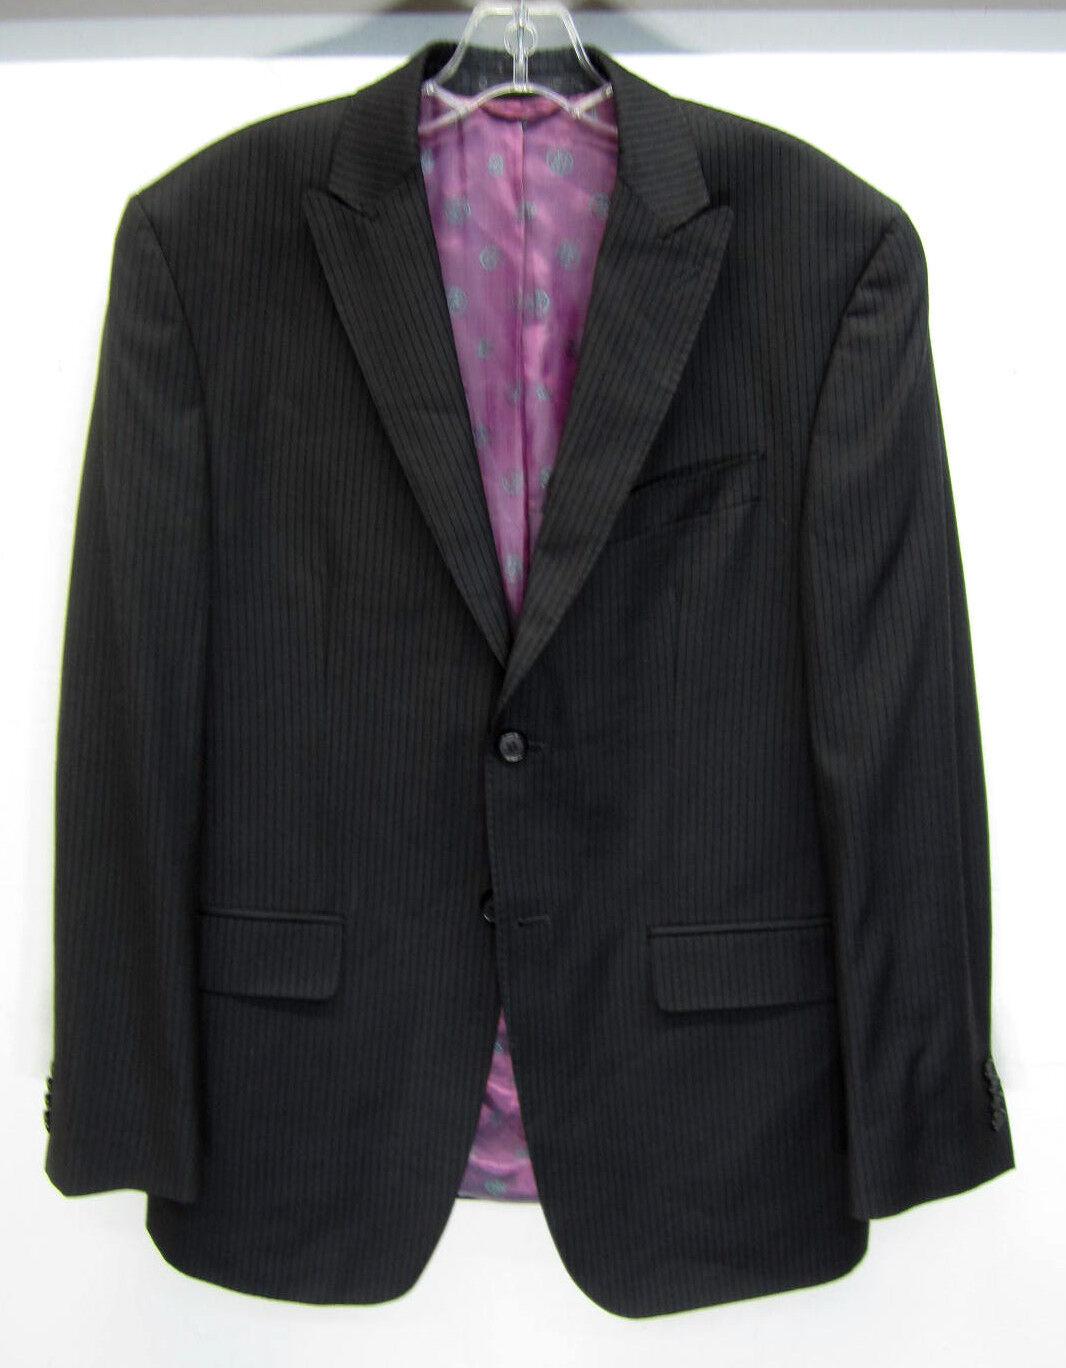 Sean John Blazer Sport Coat charcoal grau textuROT vtg pinstripe sz 38R EUC